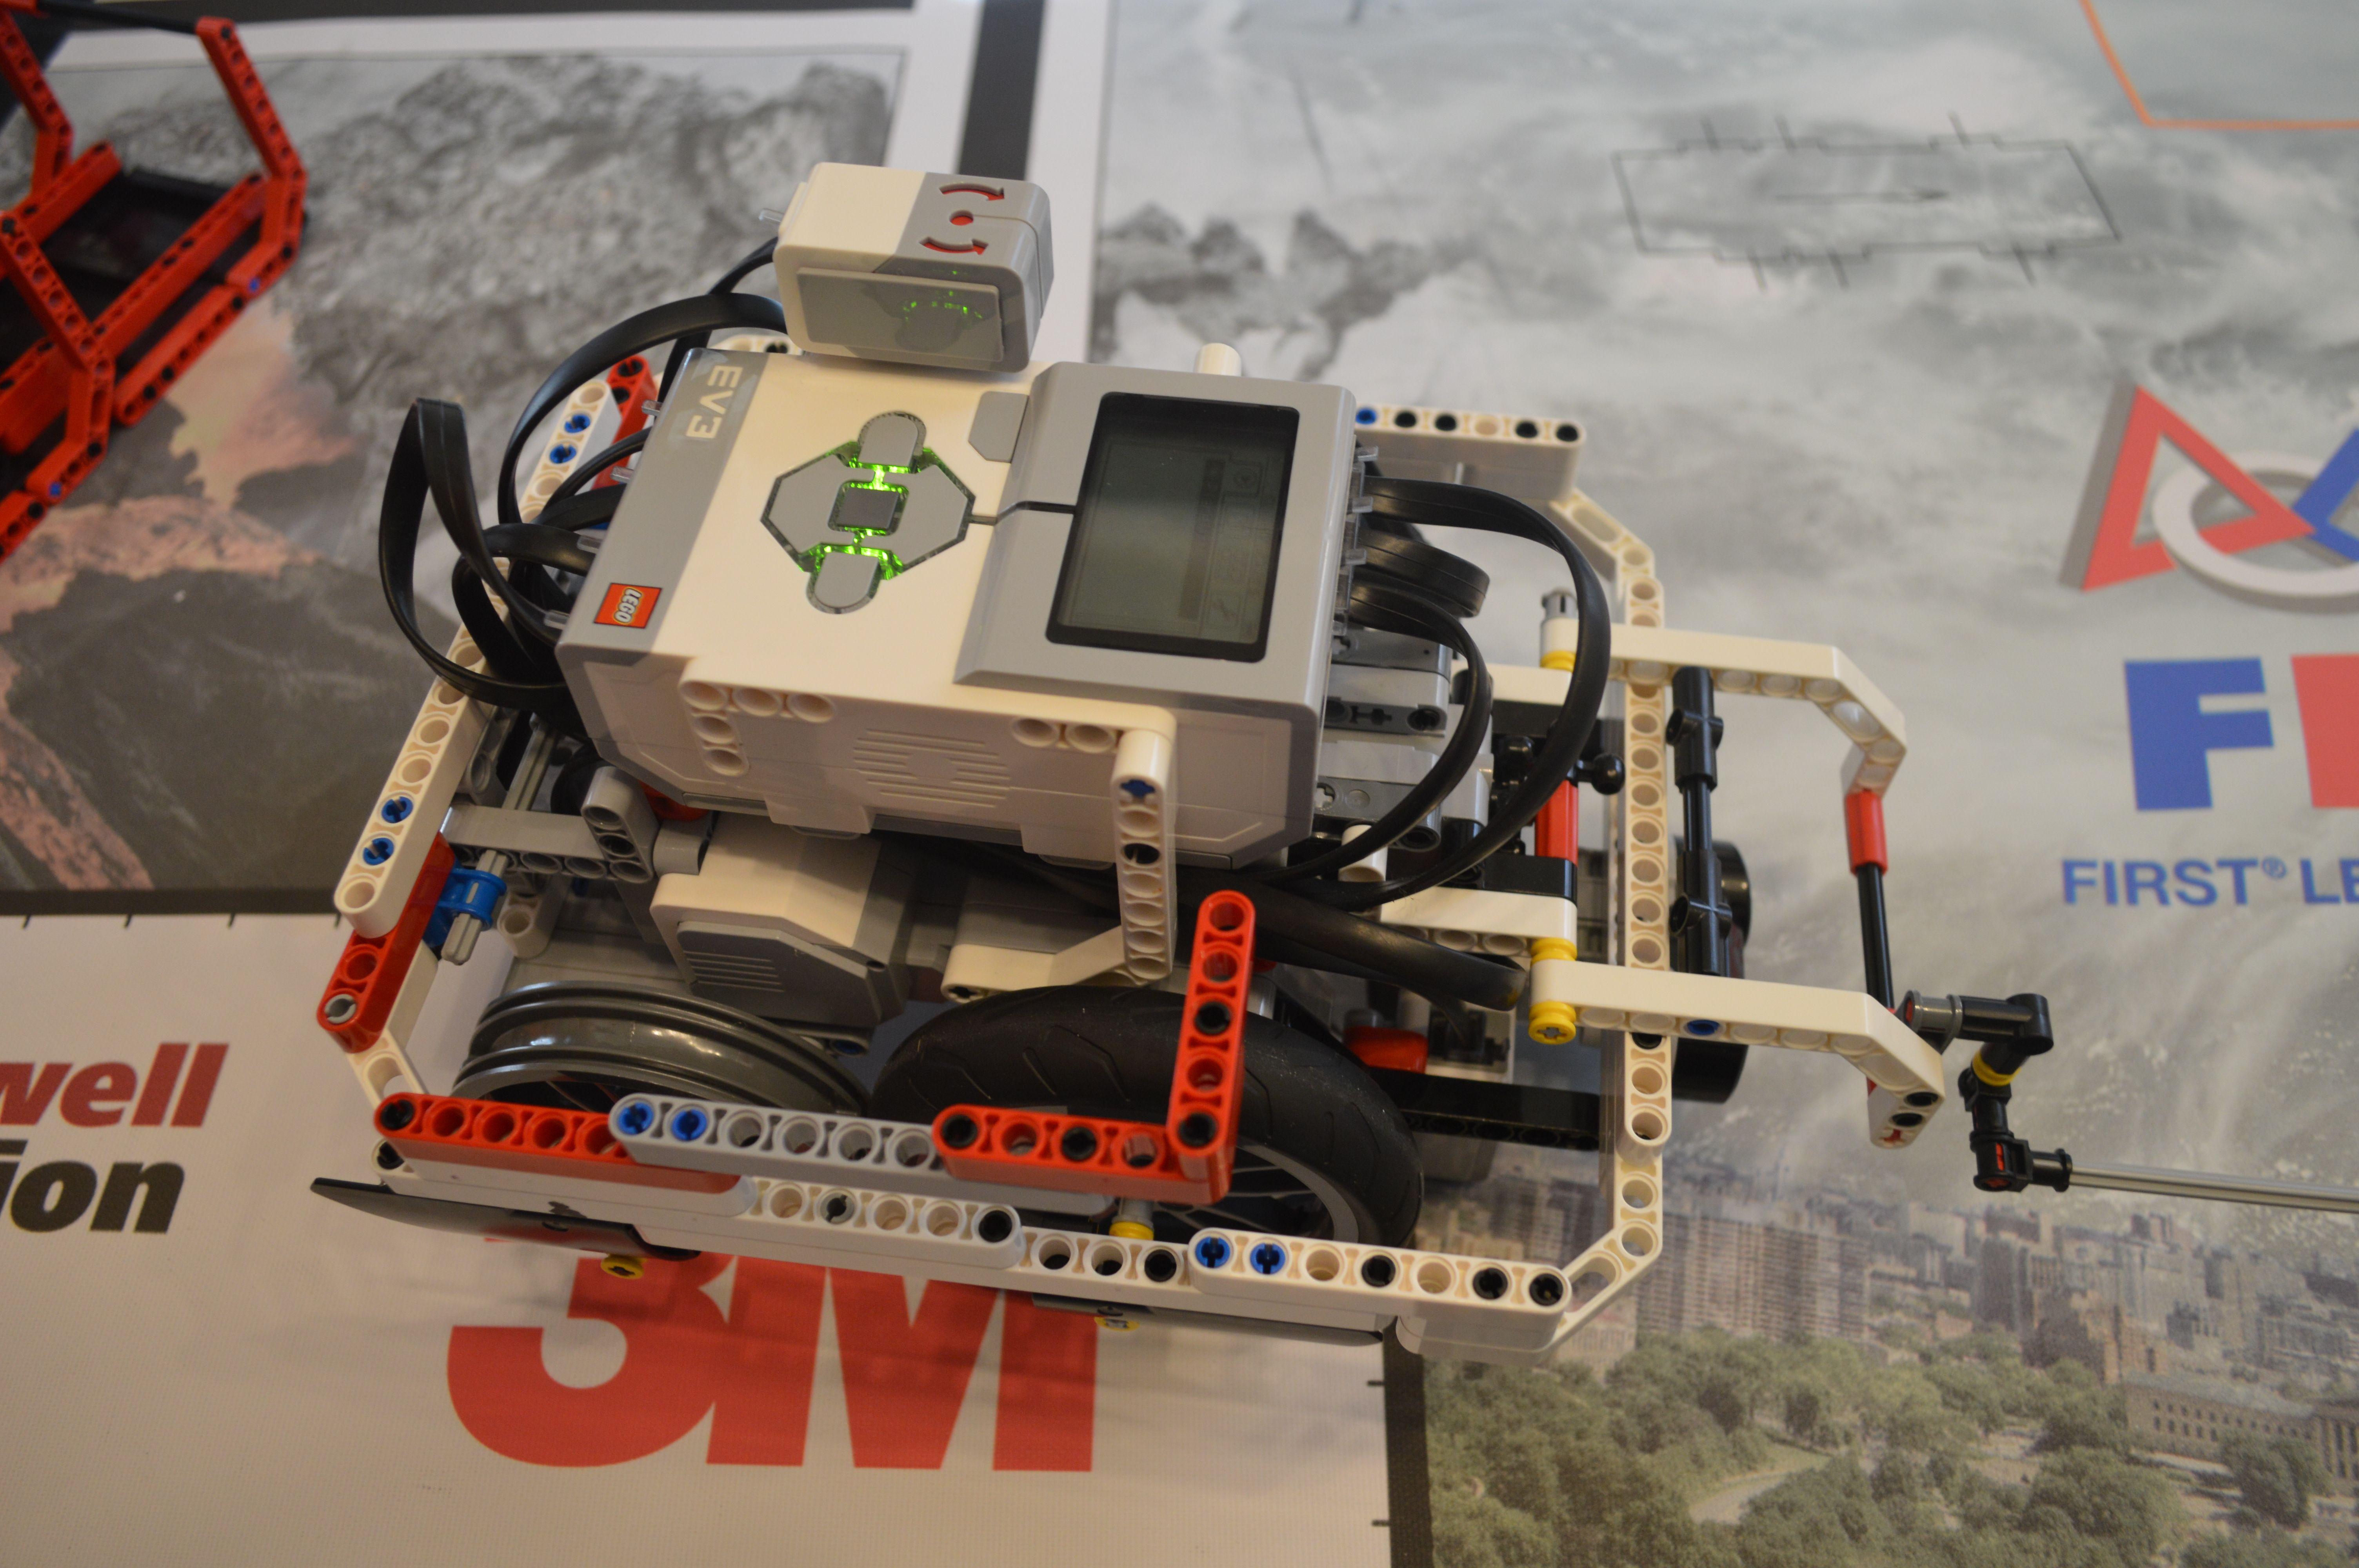 robot designs for first lego league hd photos gallery